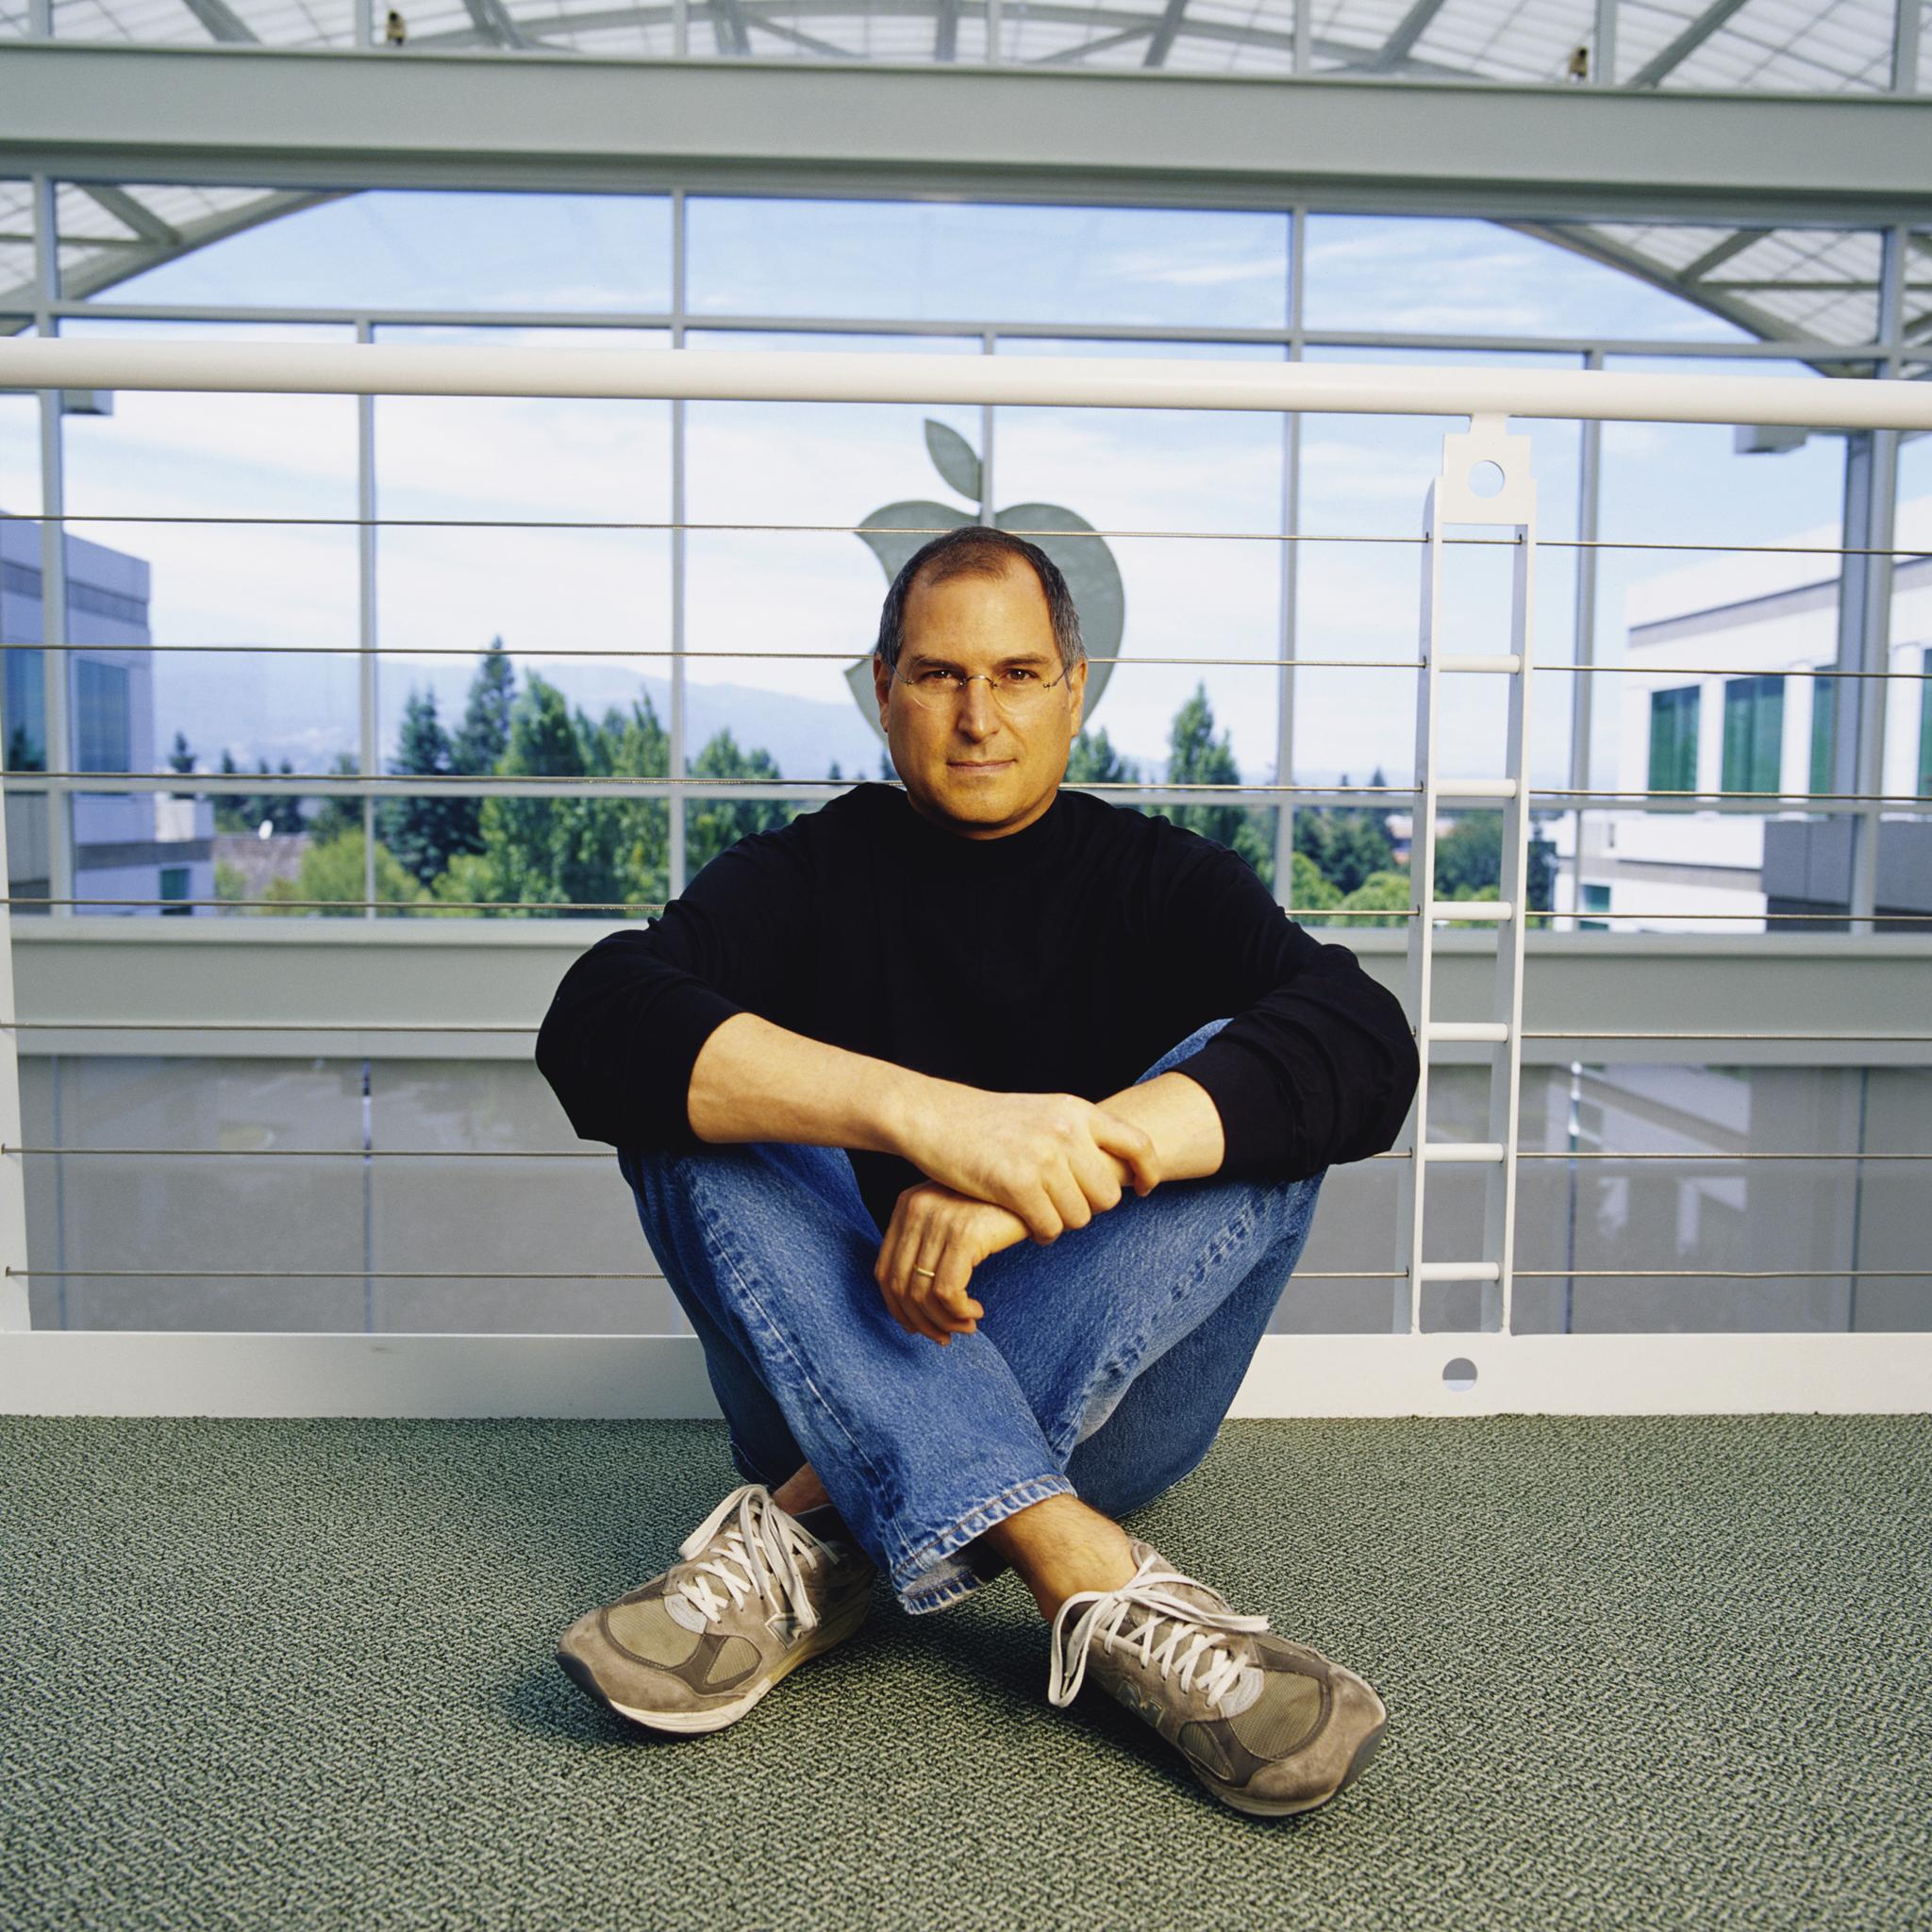 Steve-Jobs-in-Apple-3Wallpapers-iPad-Retina